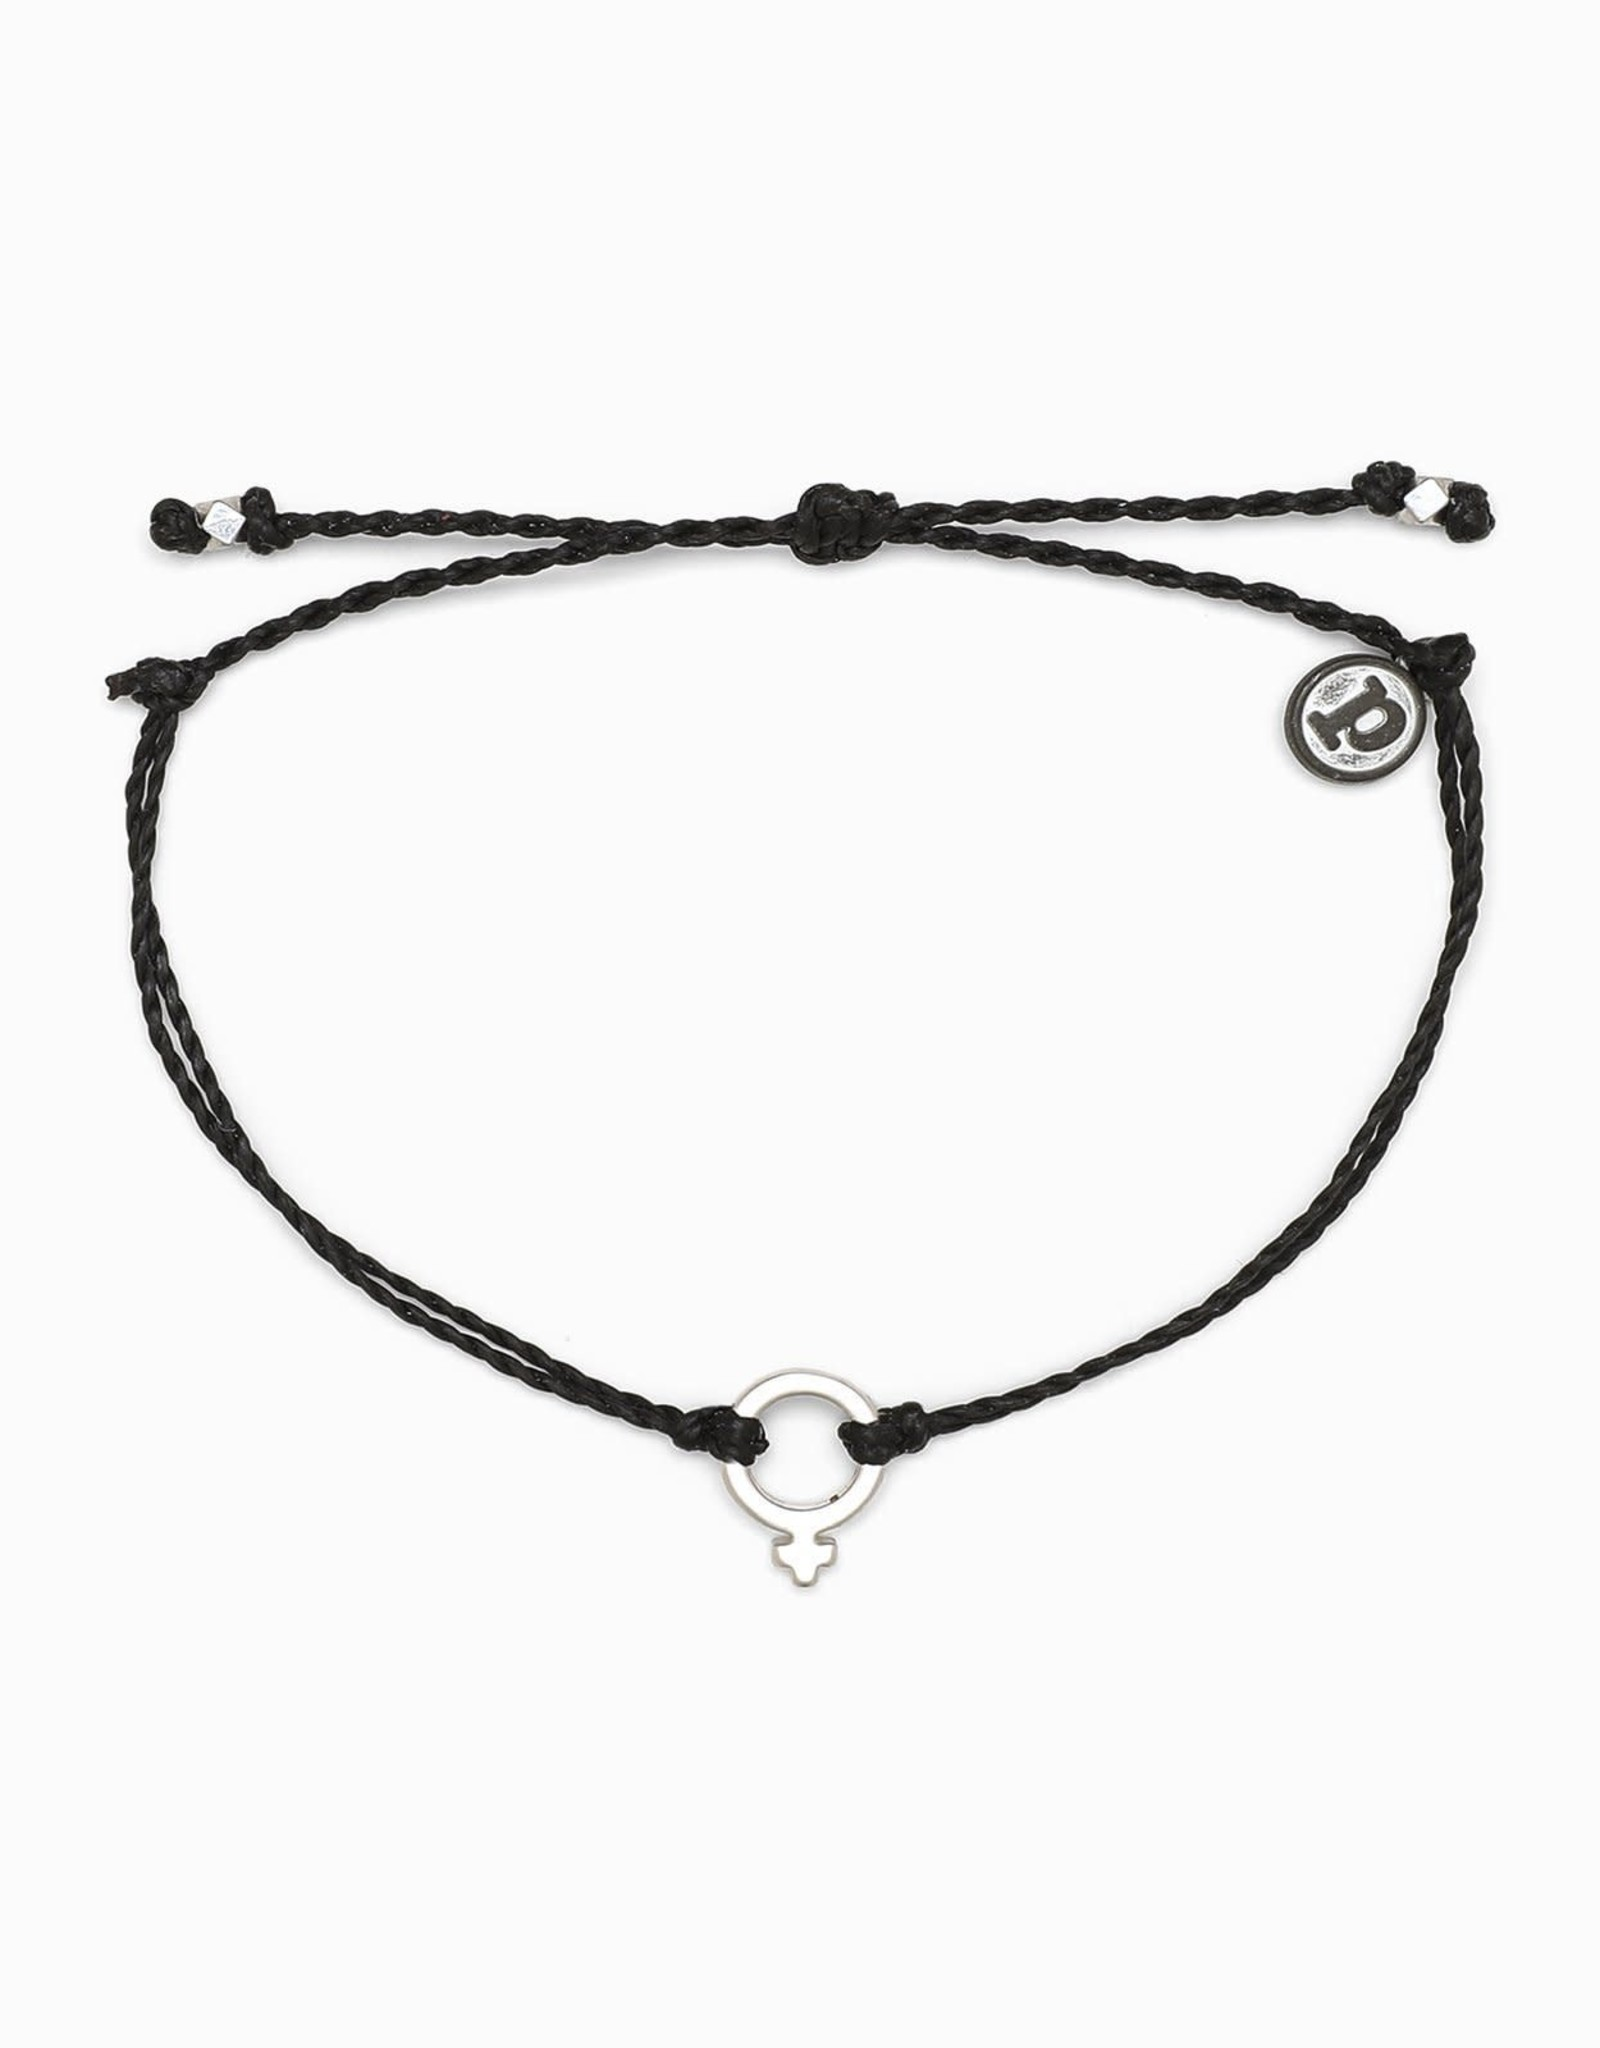 PuraVida 30% OFF PuraVida, Silver Femme Bracelet, Black FINAL SALE